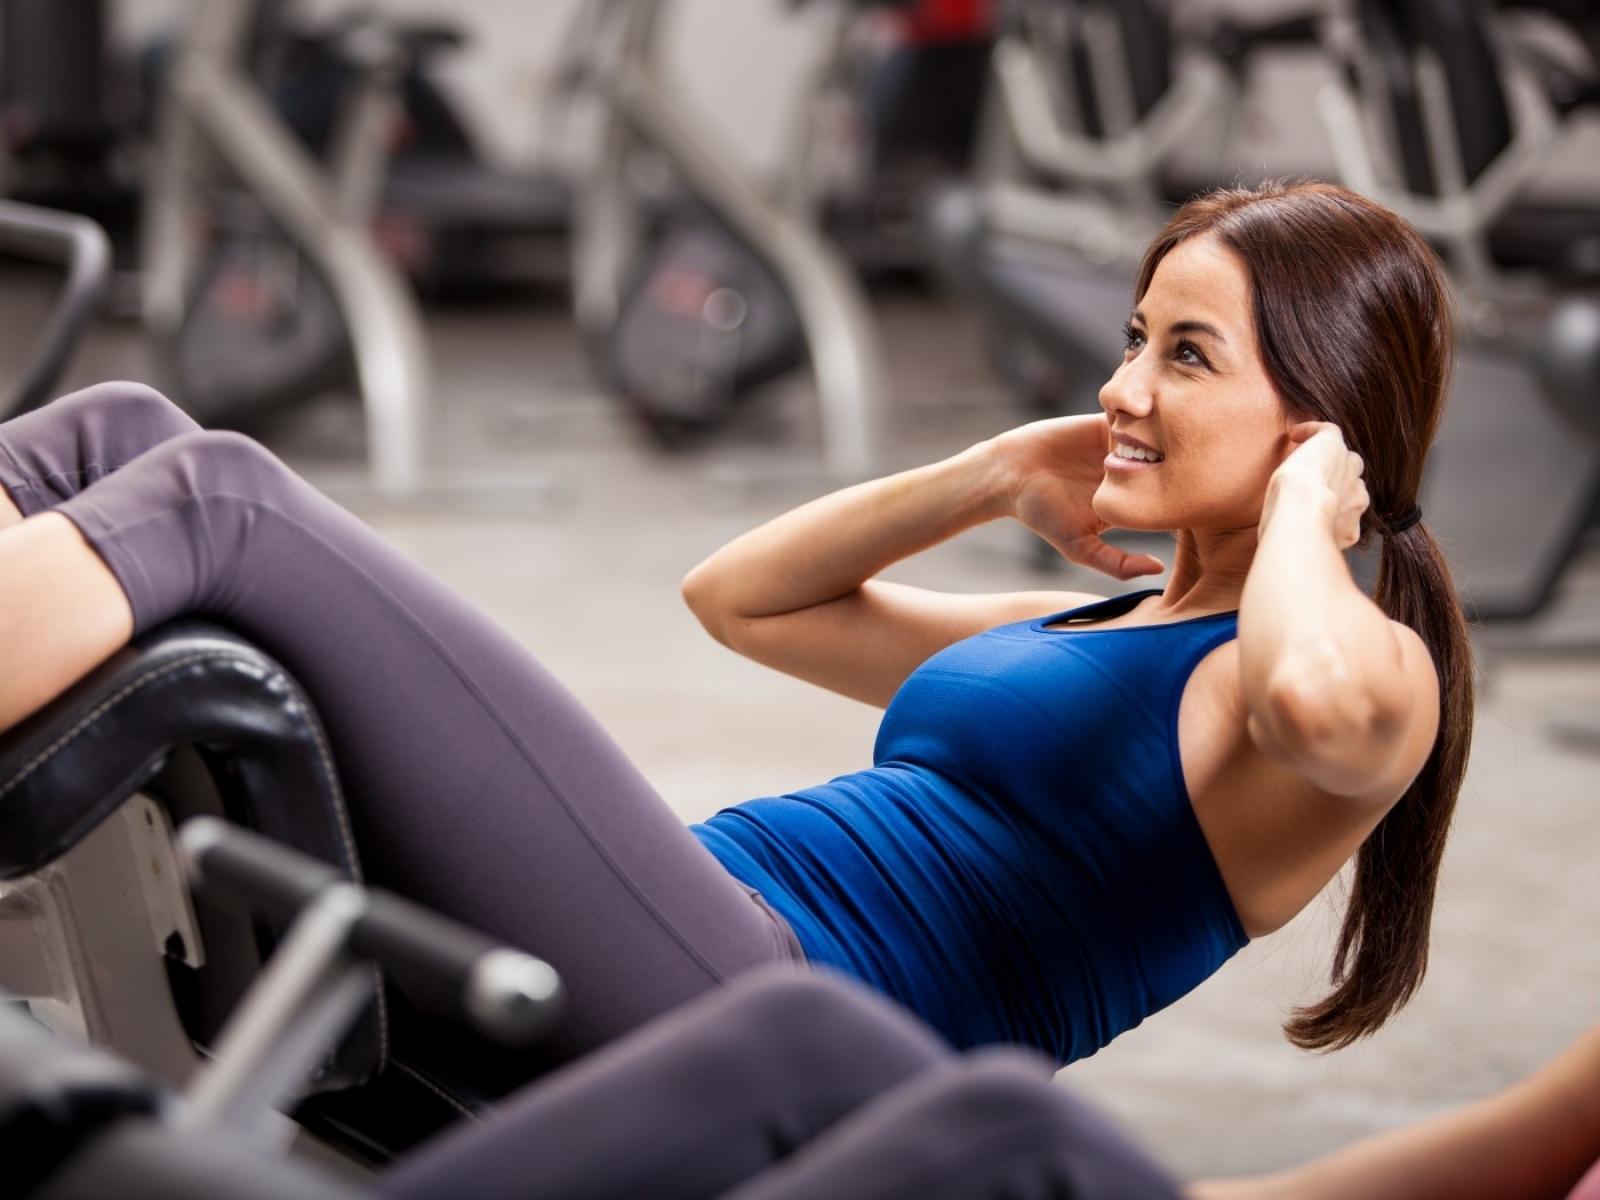 Программа тренировок на силу мышц в зале и в домашних условиях